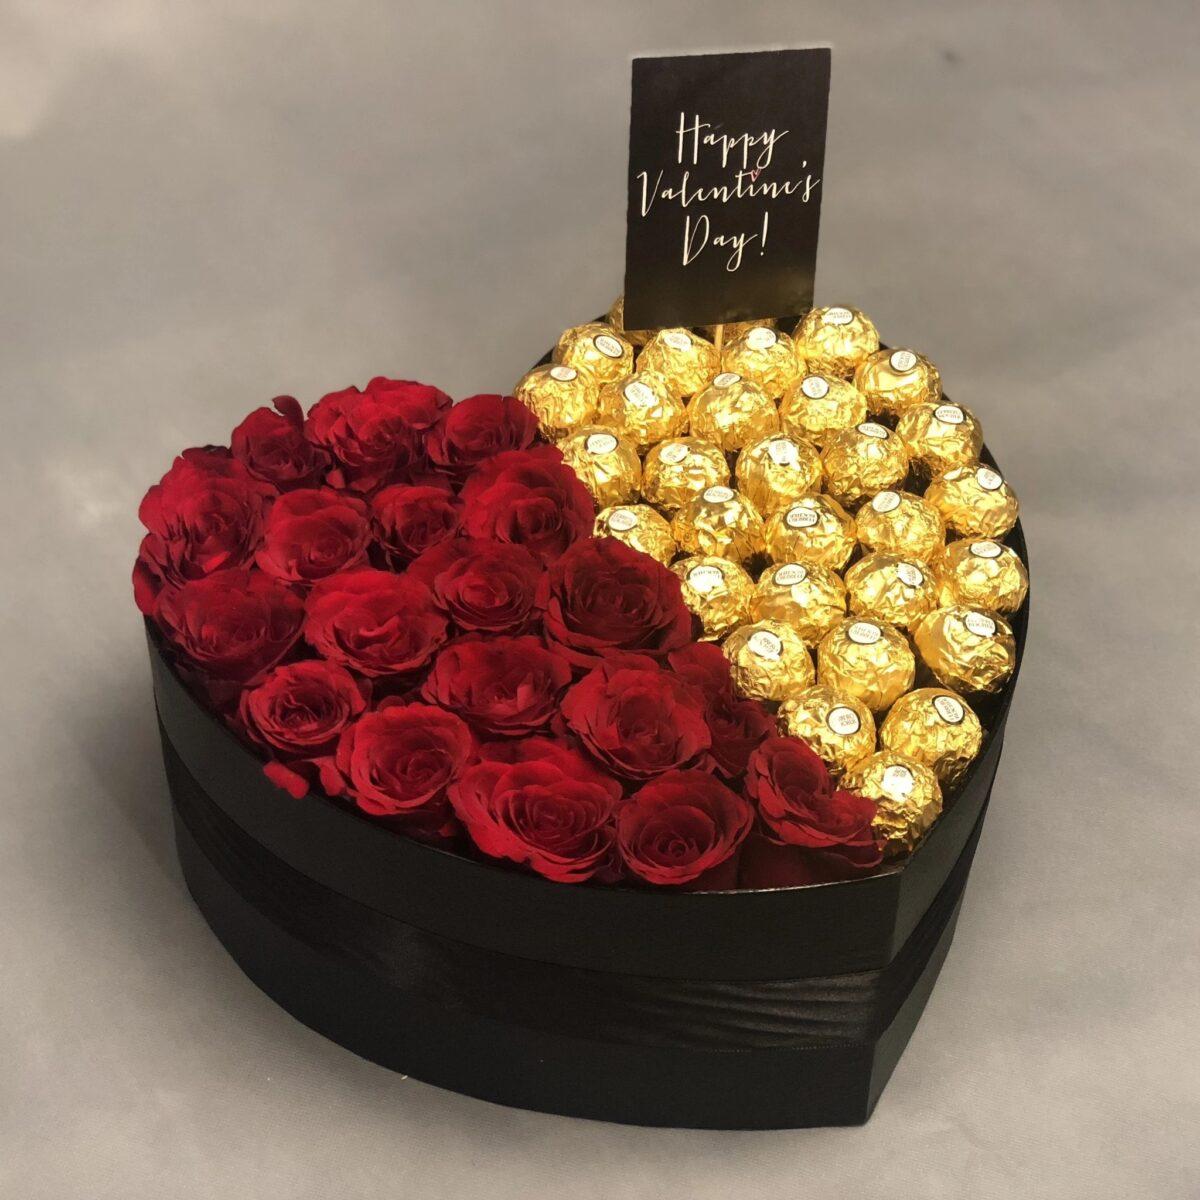 Order Flowers Online in Lahore - FromYouFlowers.pk